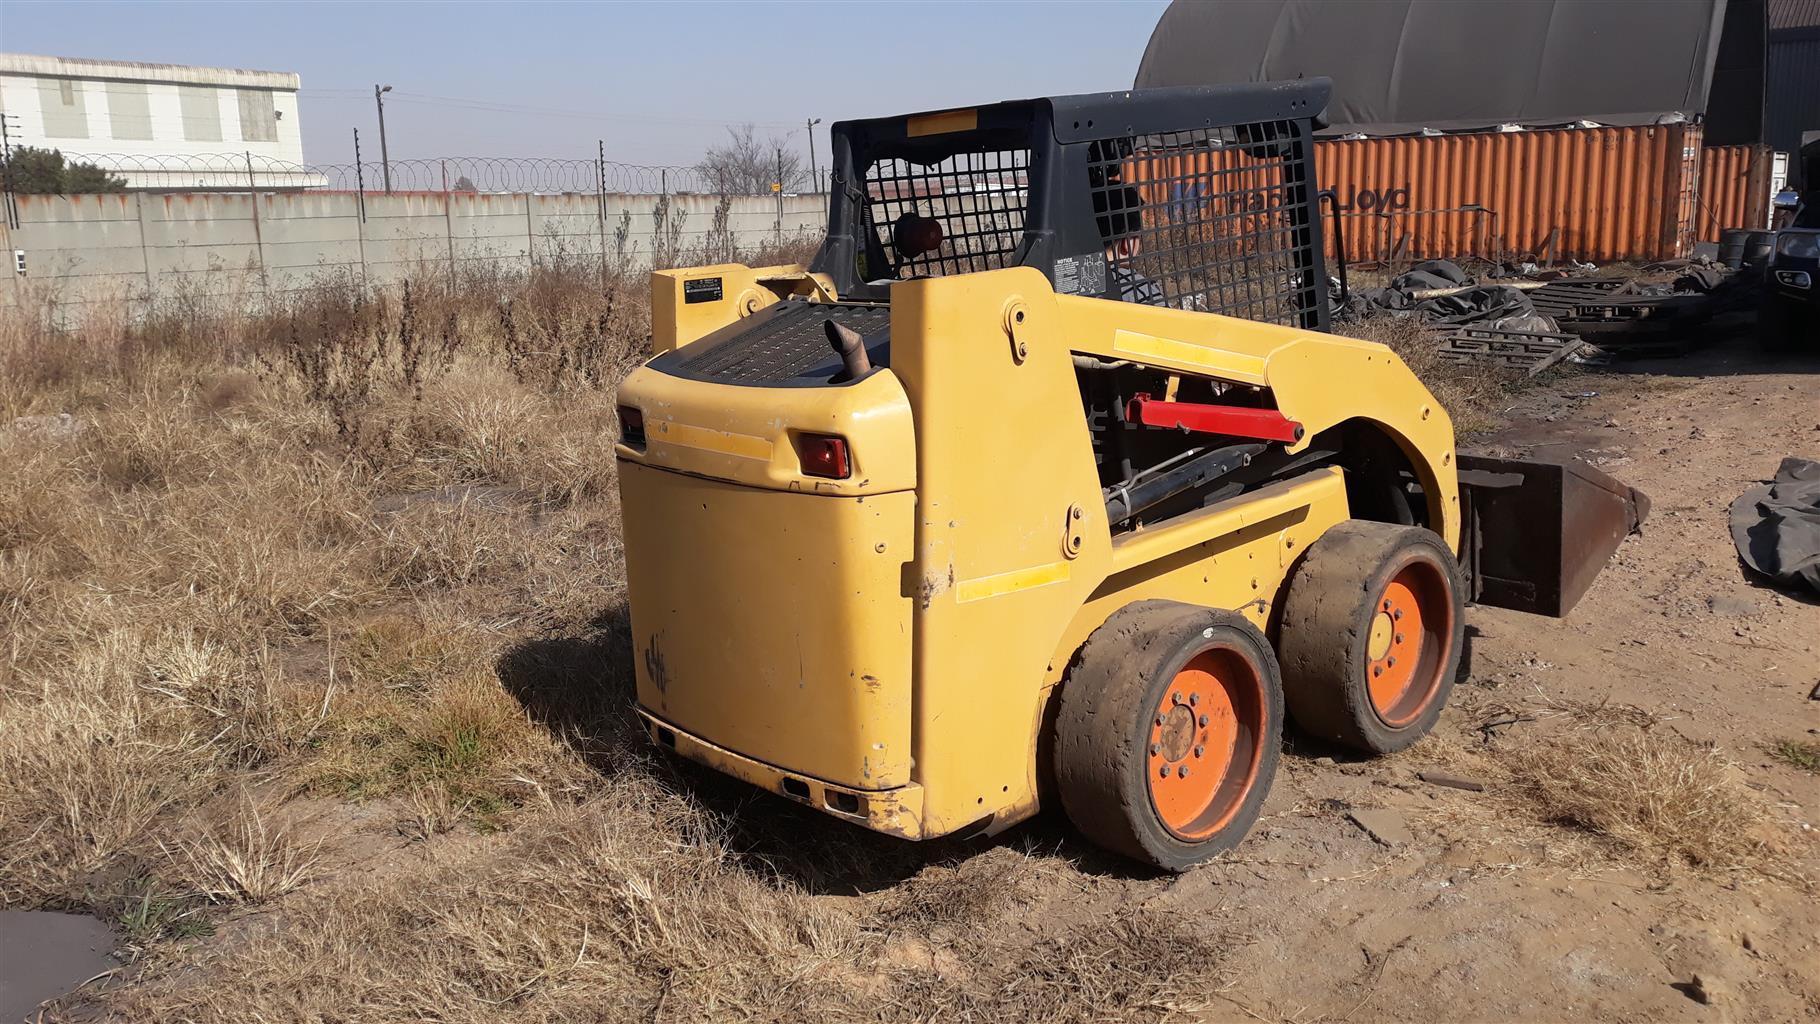 CAT Skidsteer 216B For Sale